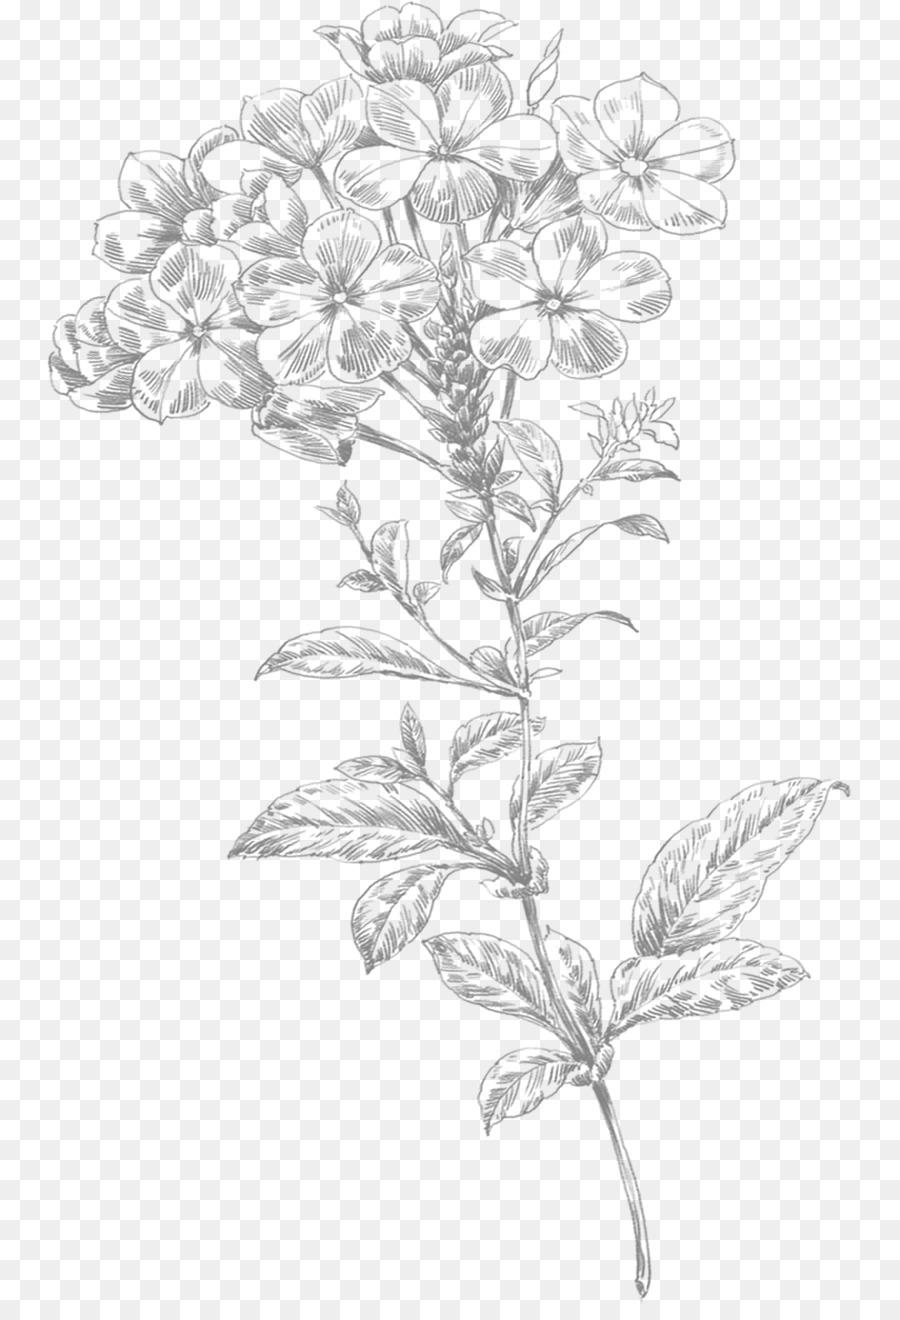 Small Flowers Line Drawing : Línea de arte la flor dibujo